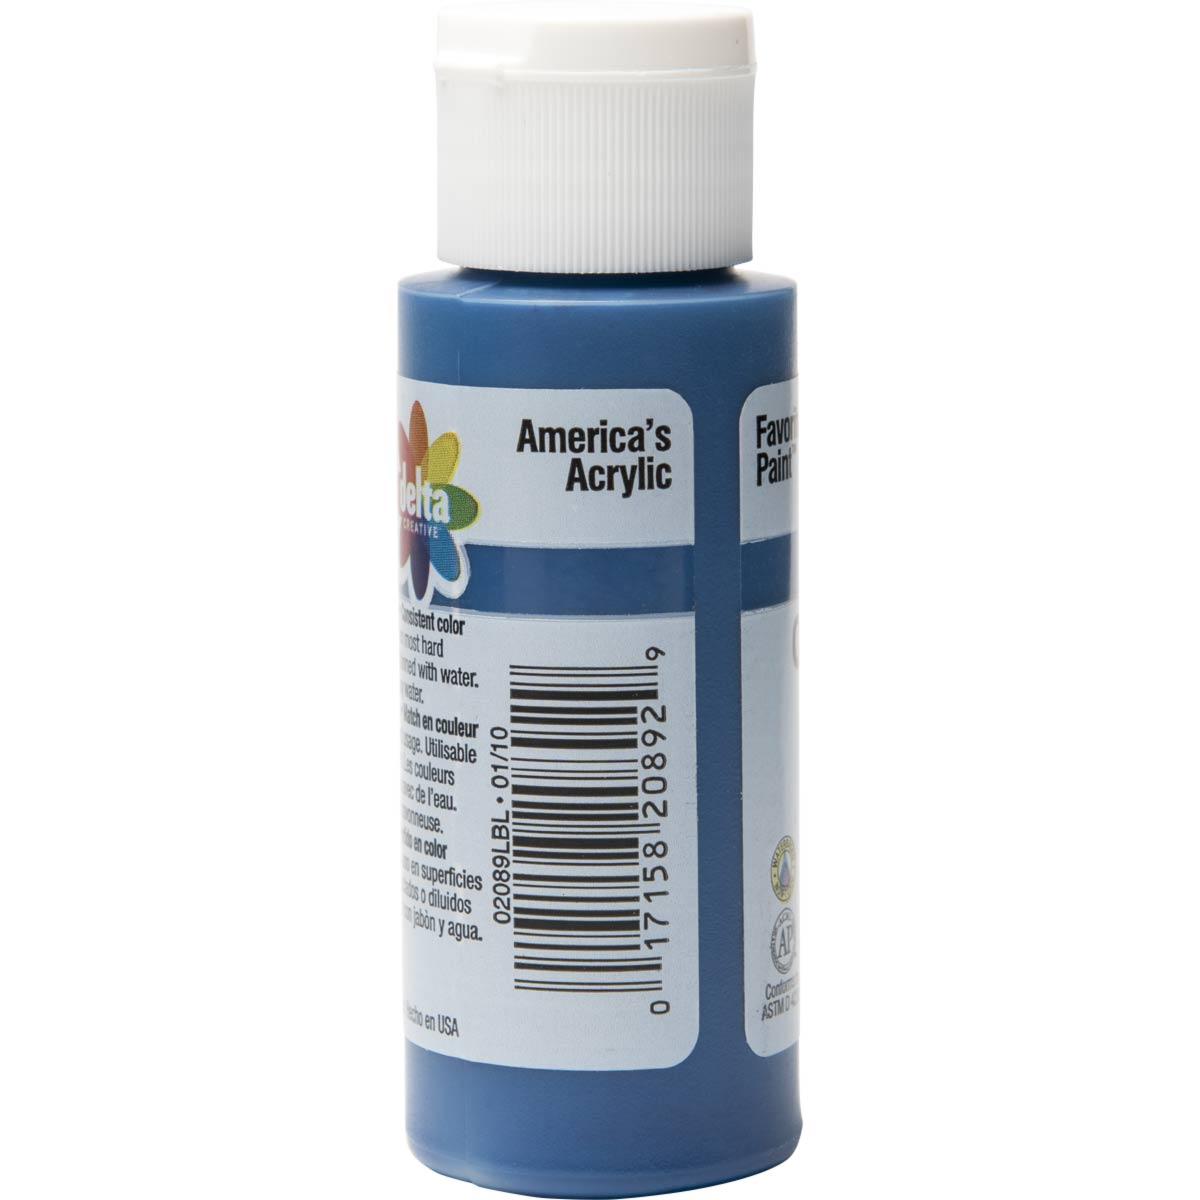 Delta Ceramcoat ® Acrylic Paint - Navy Blue, 2 oz.